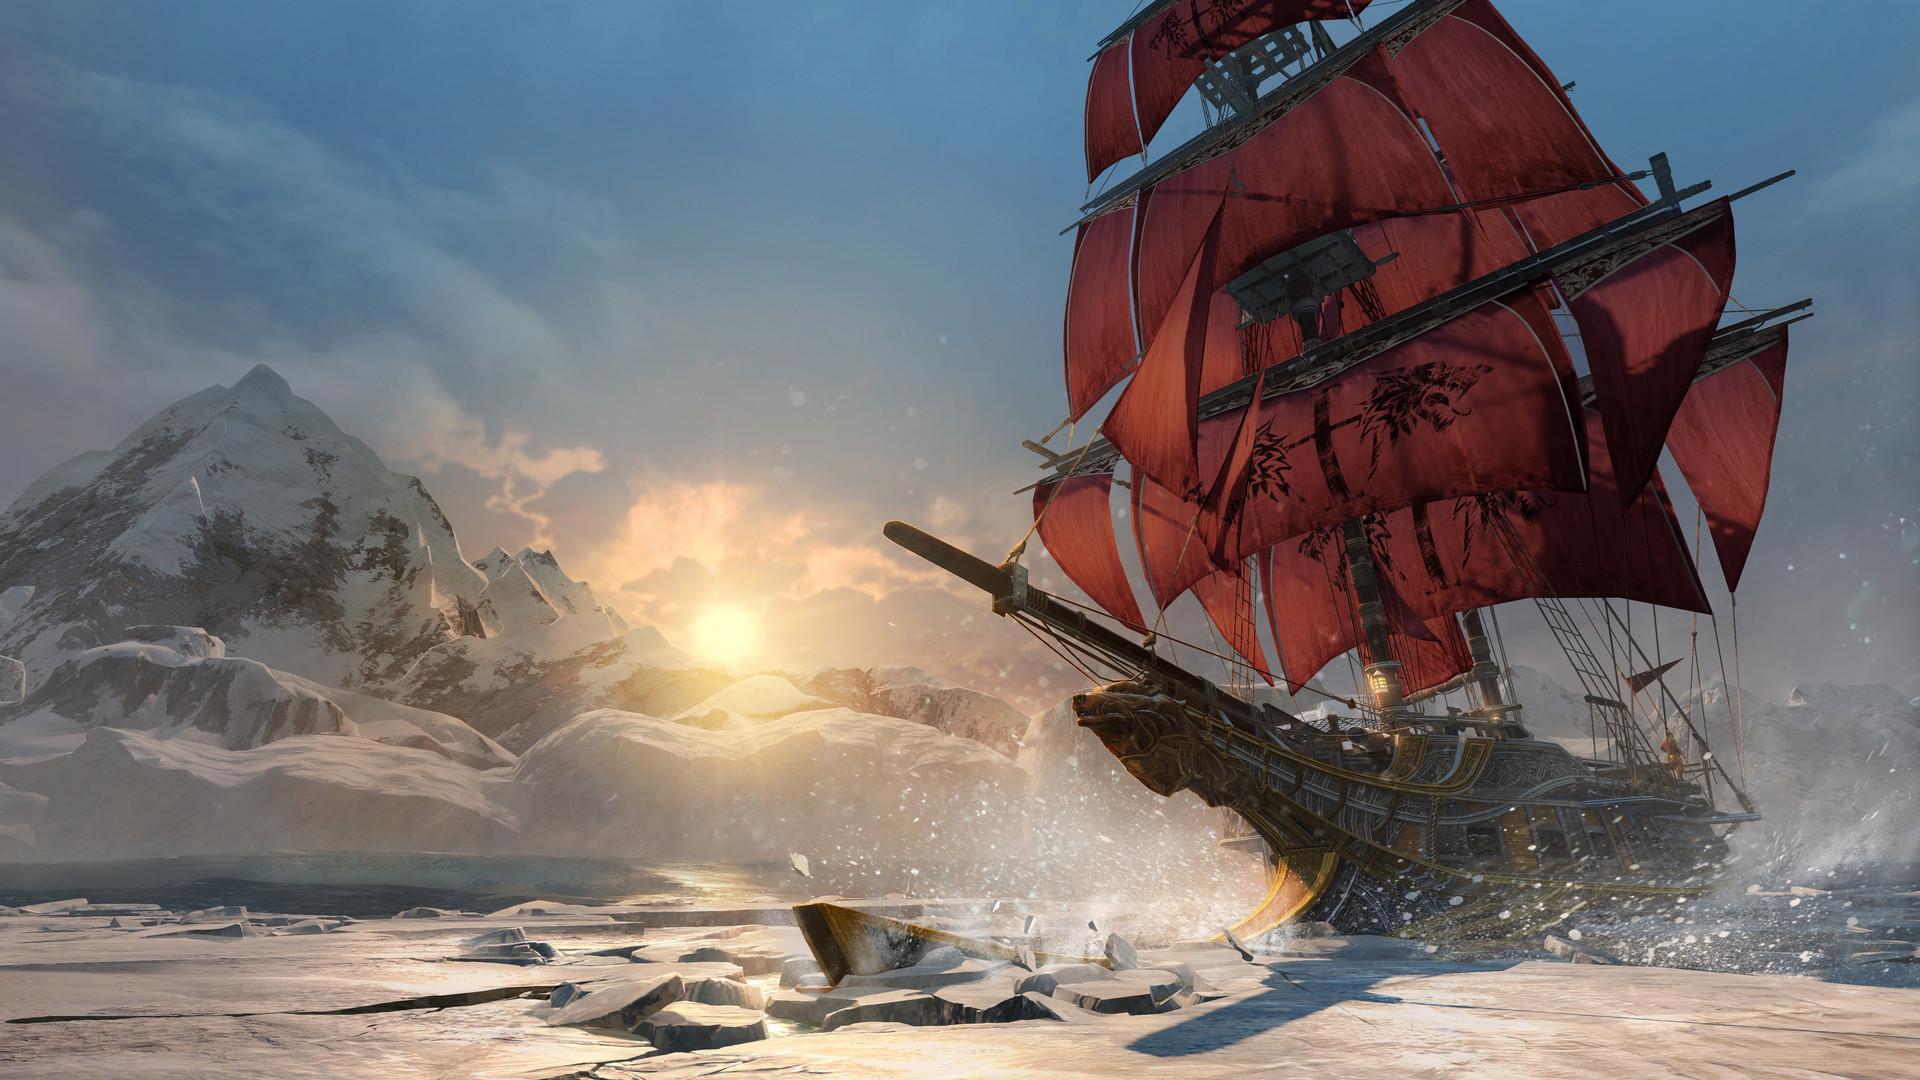 Assassin's Creed: Rogue Screenshot 5